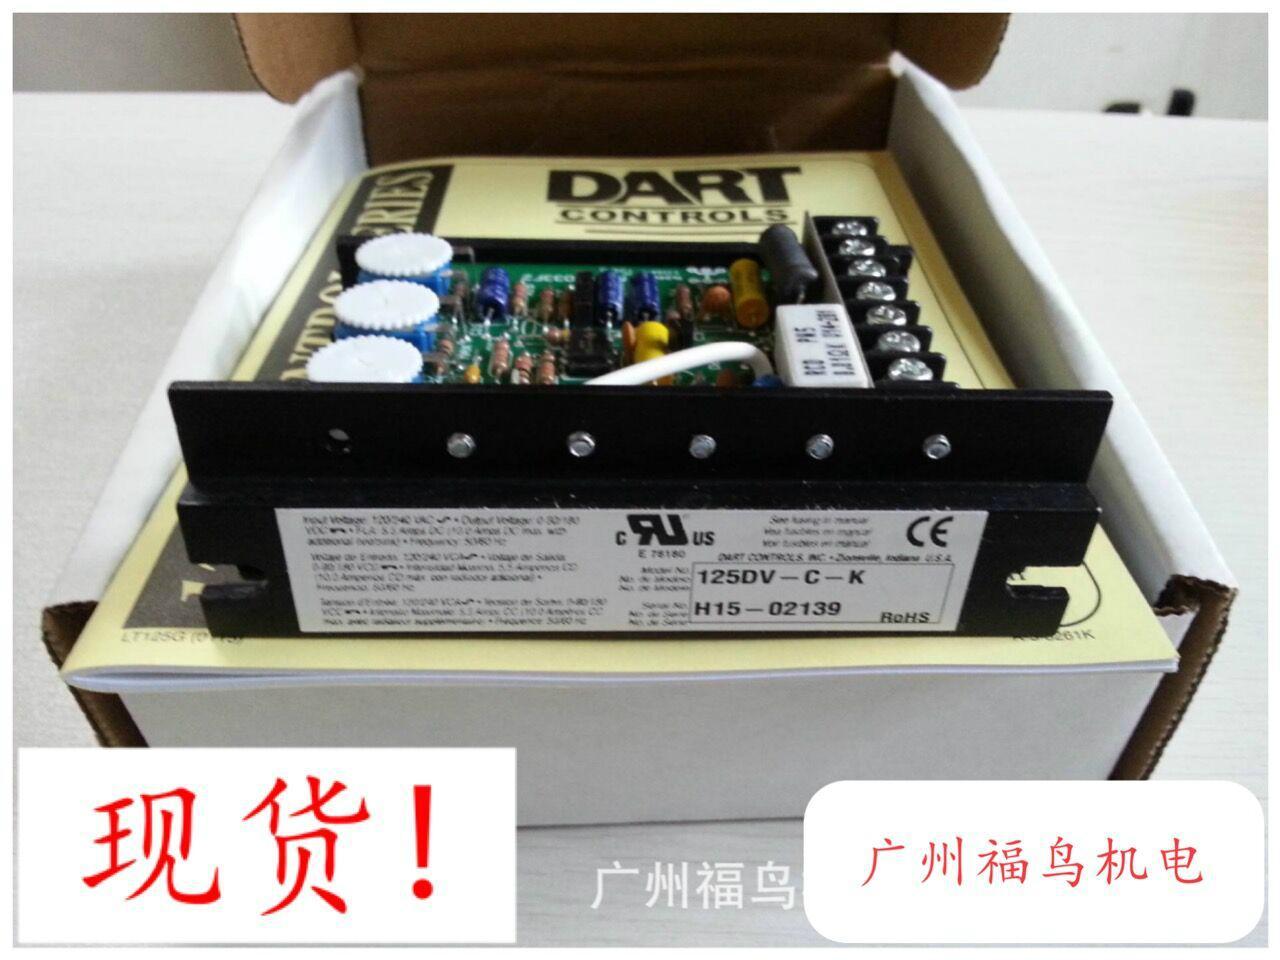 DART CONTROLS调速器, 型号: 125DV-C-K